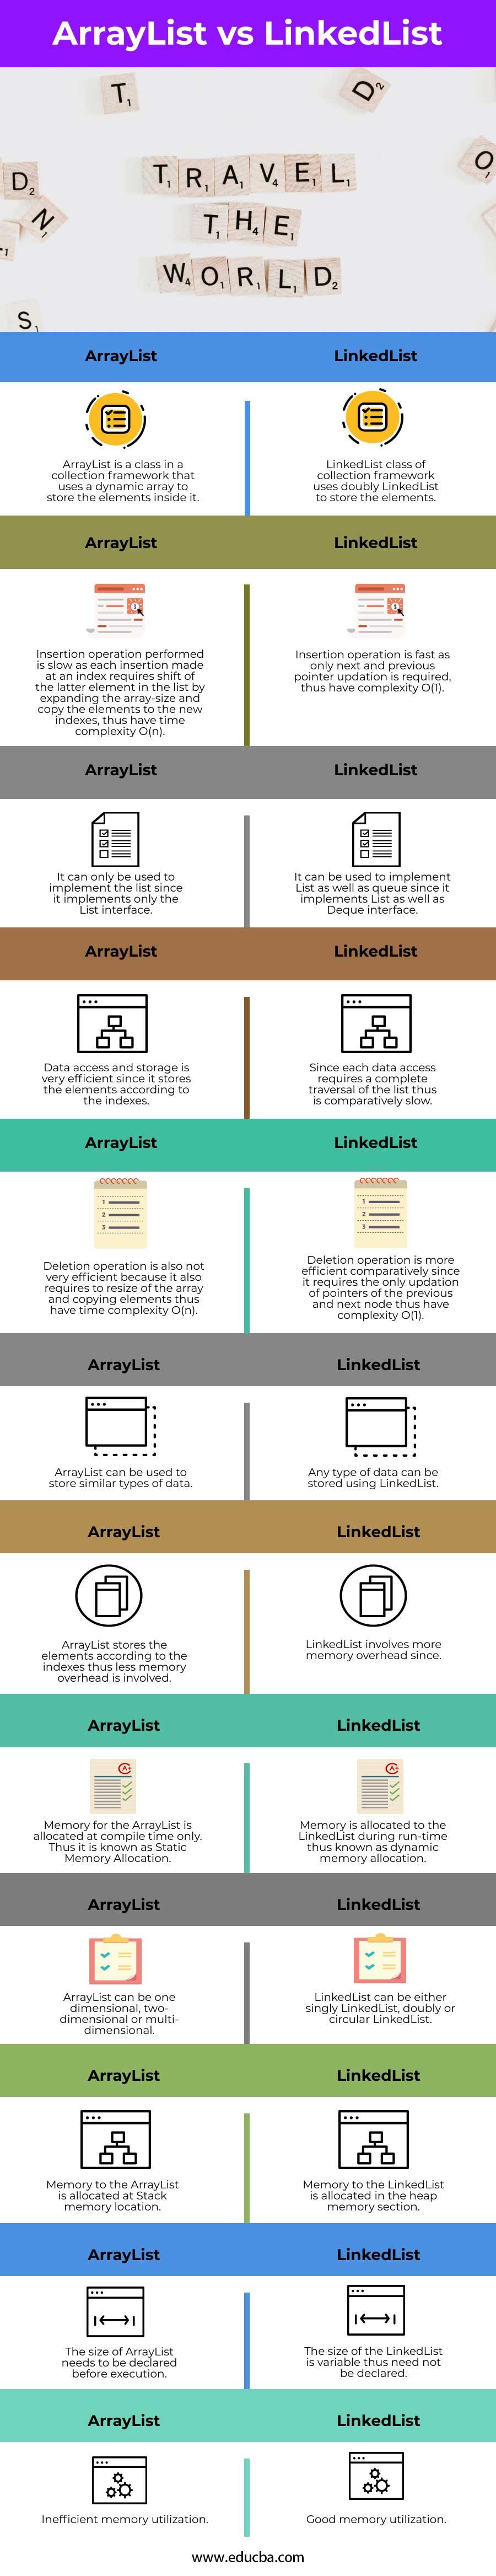 ArrayList-vs-LinkedList-info